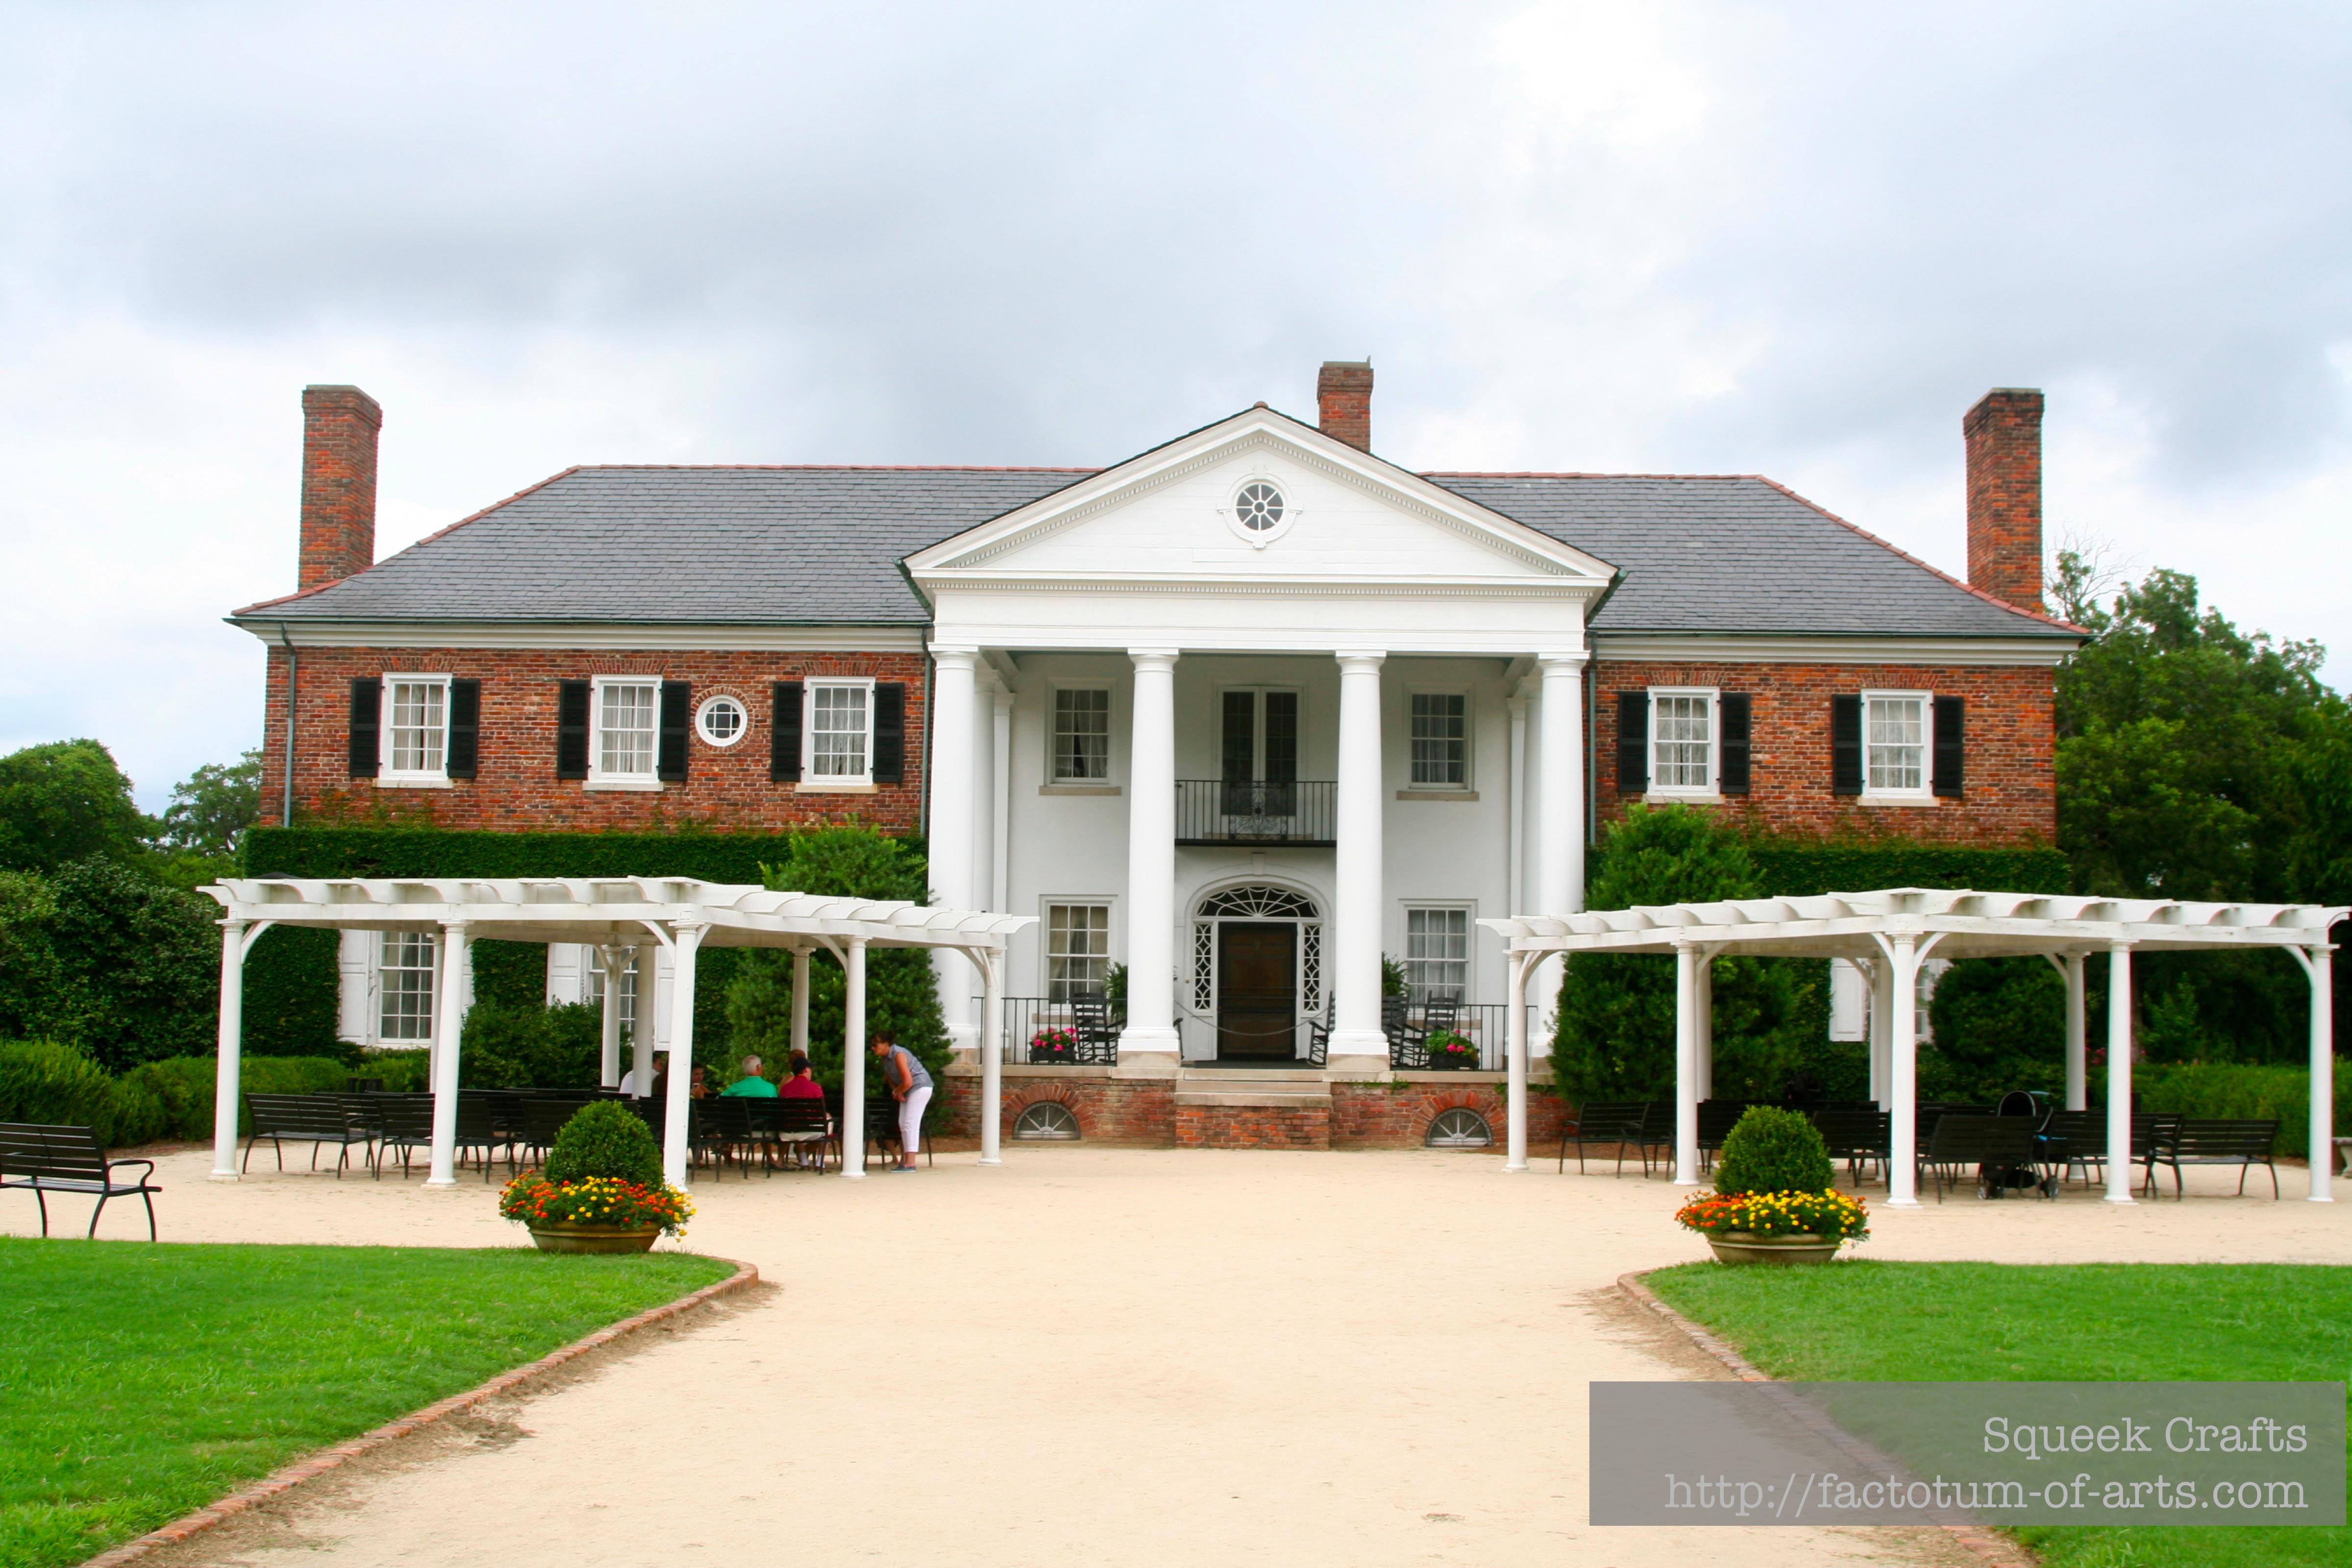 Boone Hall Plantation Factotum Of Arts